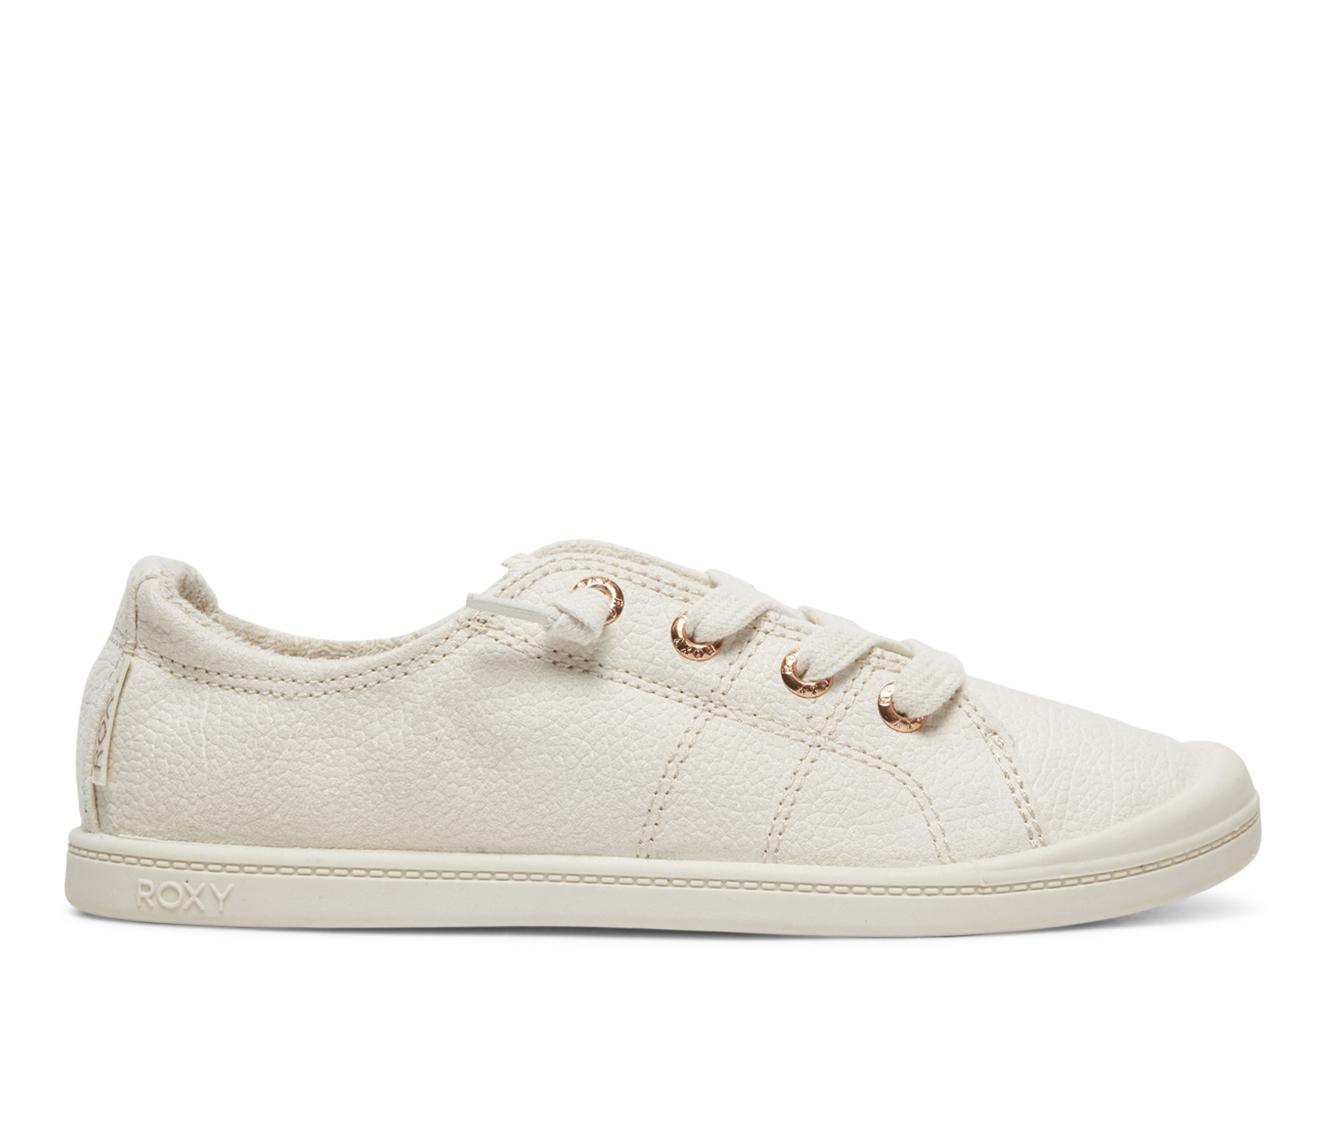 Roxy Bayshore Women's Shoe (White Canvas)